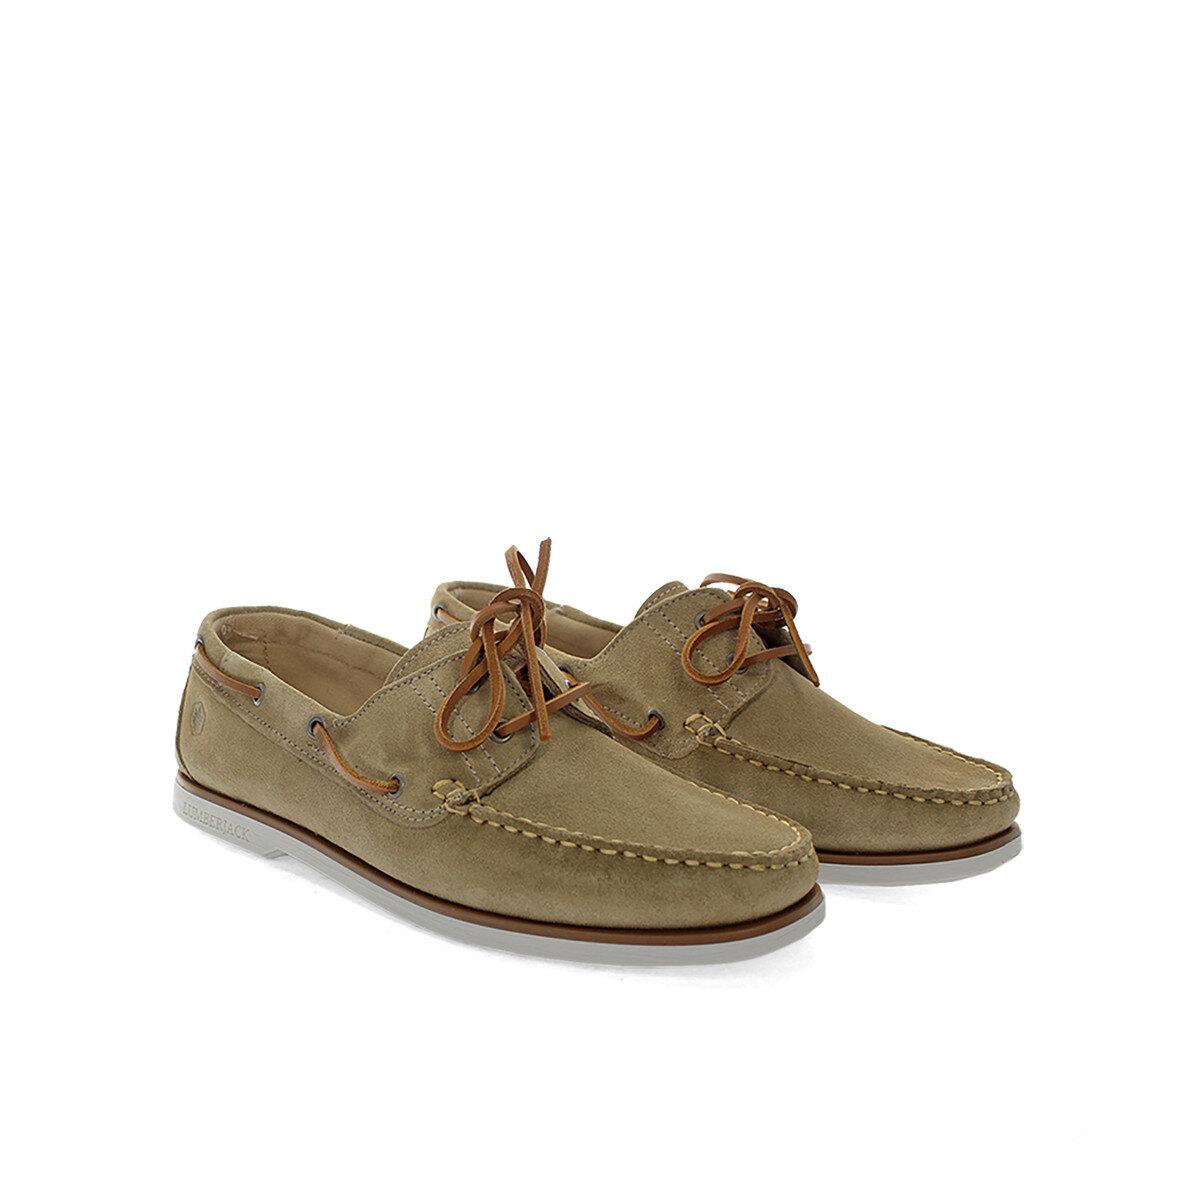 NAVIGATOR Boat shoes Man